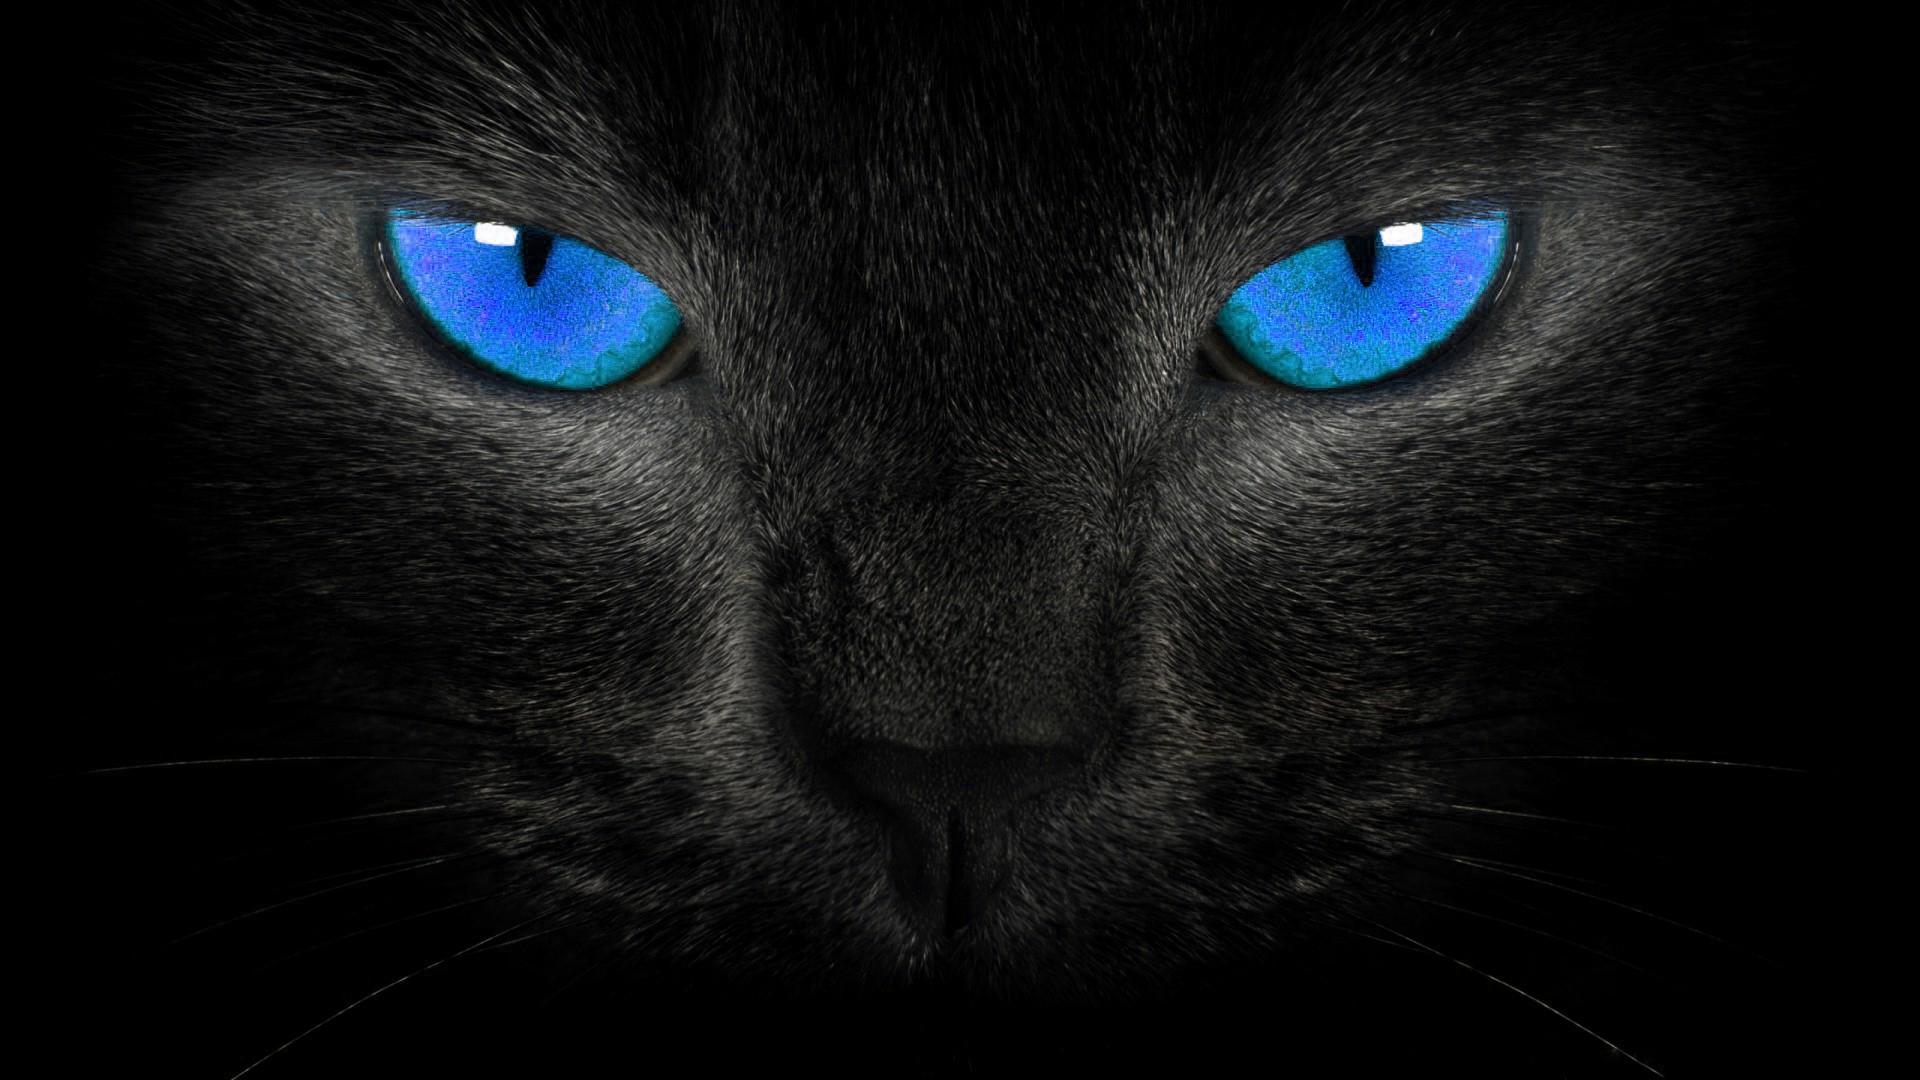 <b>Blue eyes wallpapers</b> | <b>Blue eyes</b> stock photos